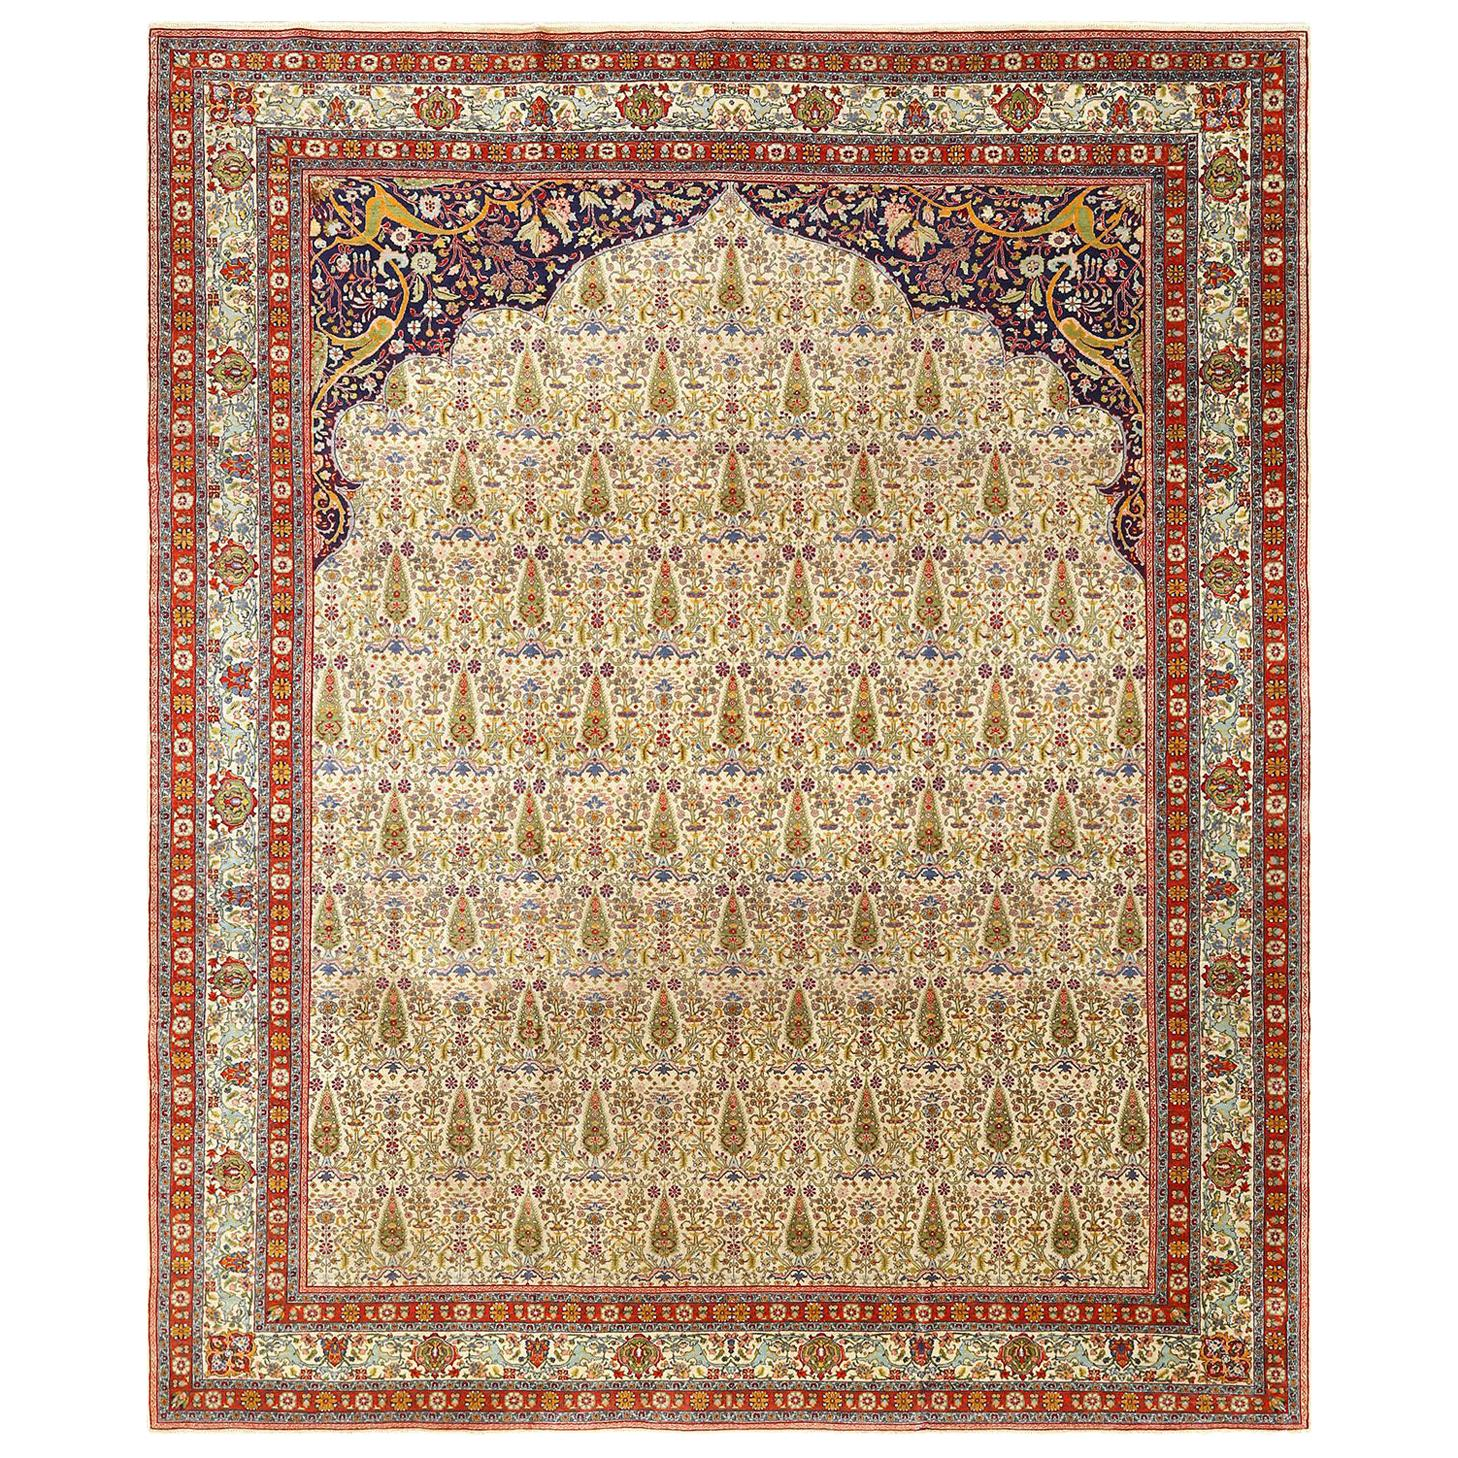 Antique Prayer Design Tabriz Persian Rug. Size: 8 ft 1 in x 9 ft 10 in